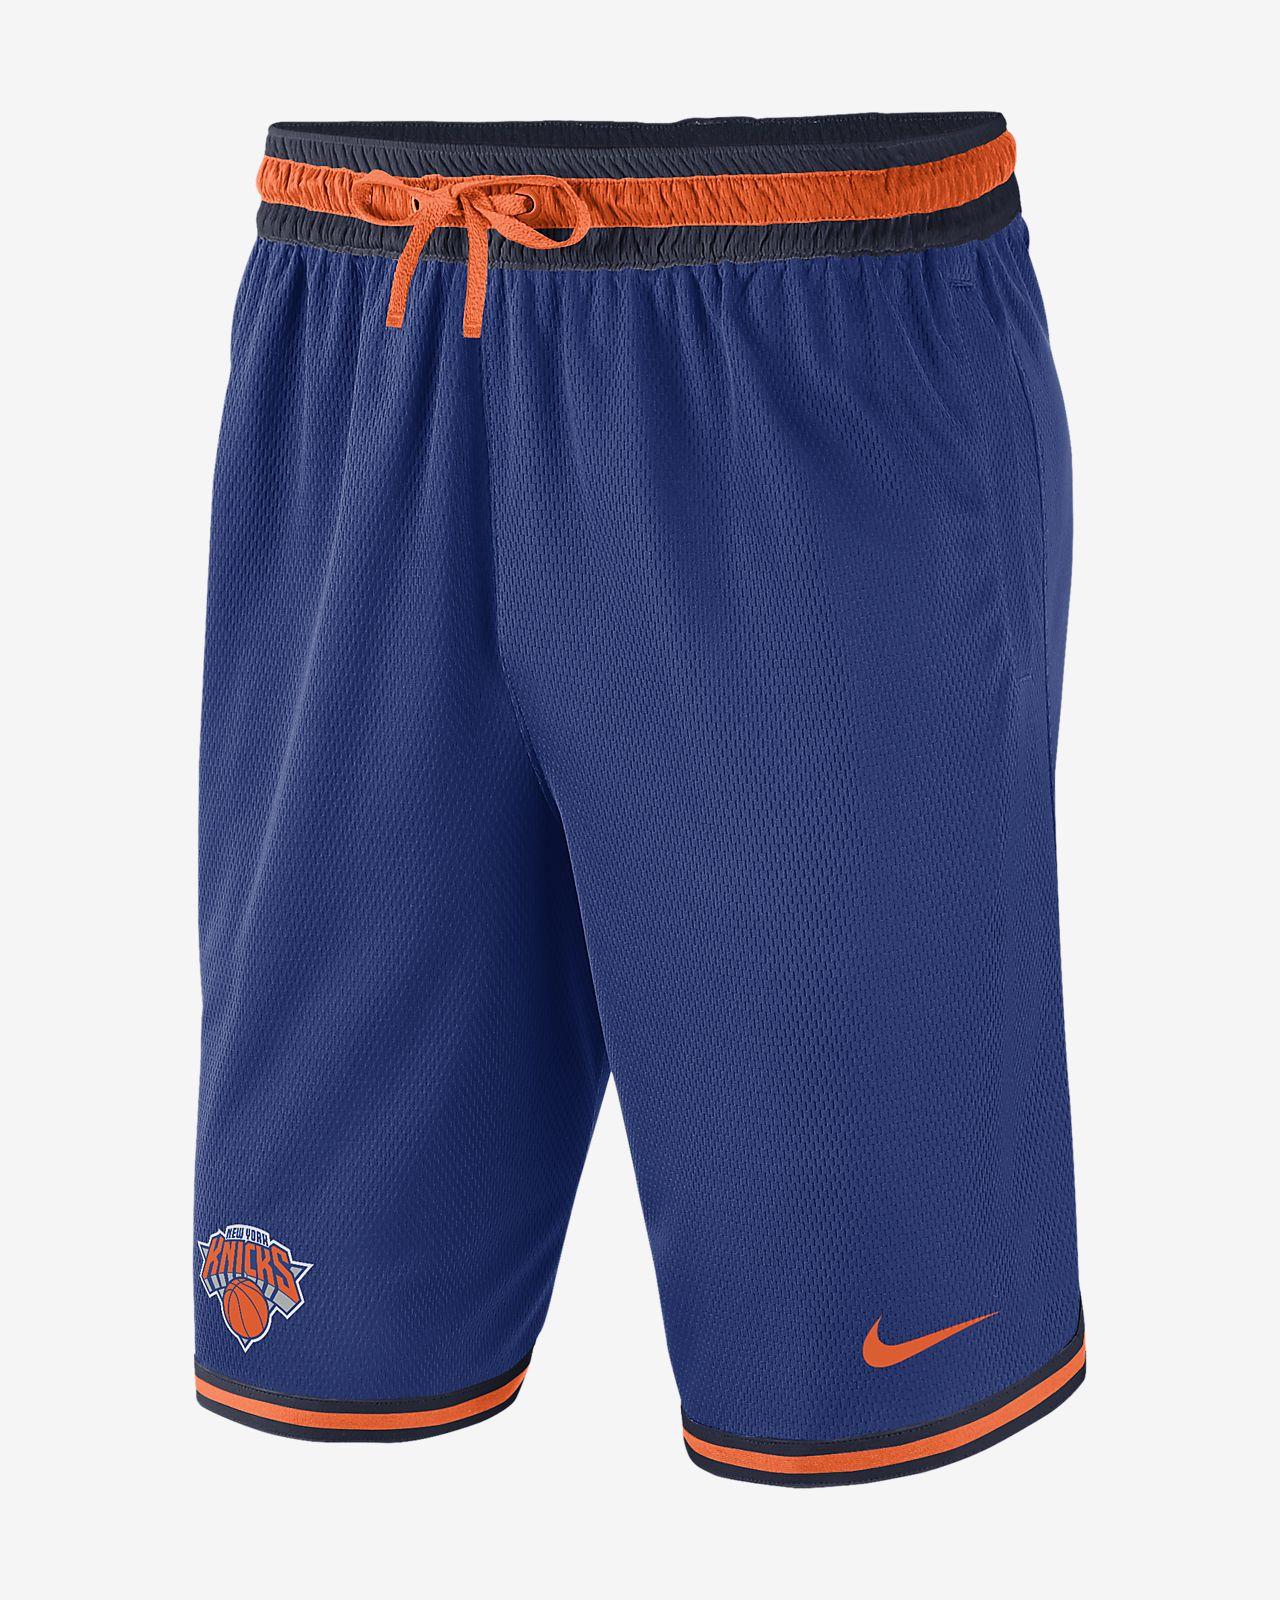 New York Knicks Nike NBA-Shorts für Herren